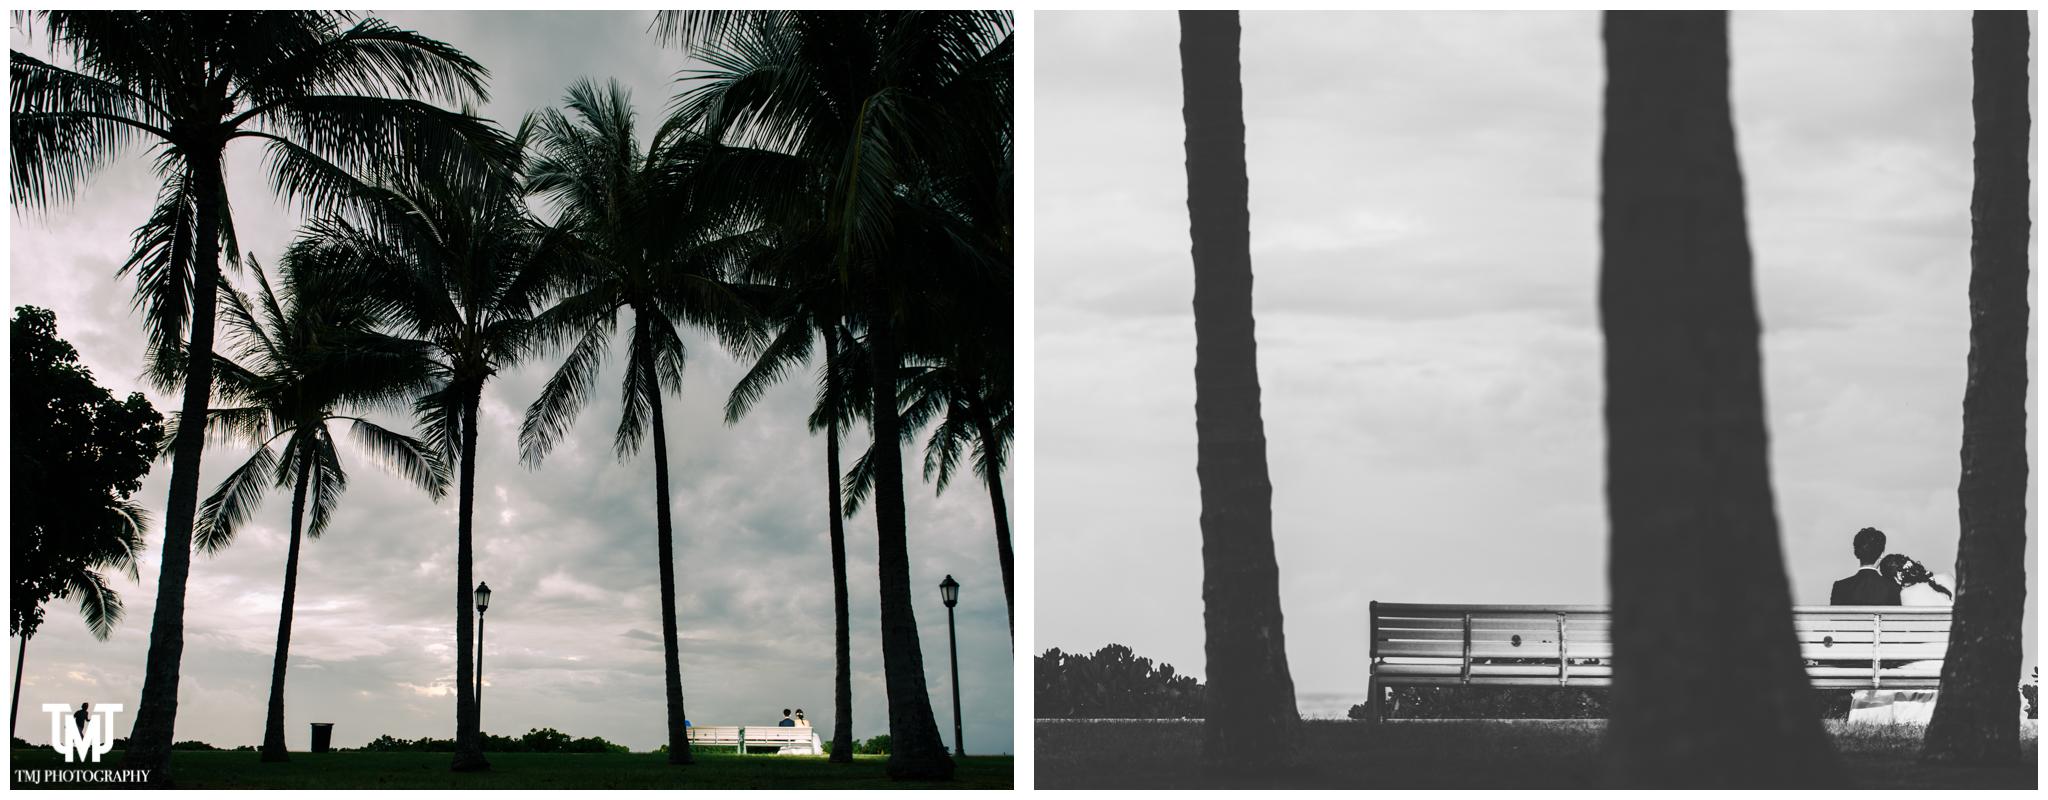 Moana Surfrider Terrace By The Sea Honolulu Destination Wedding 068.jpg